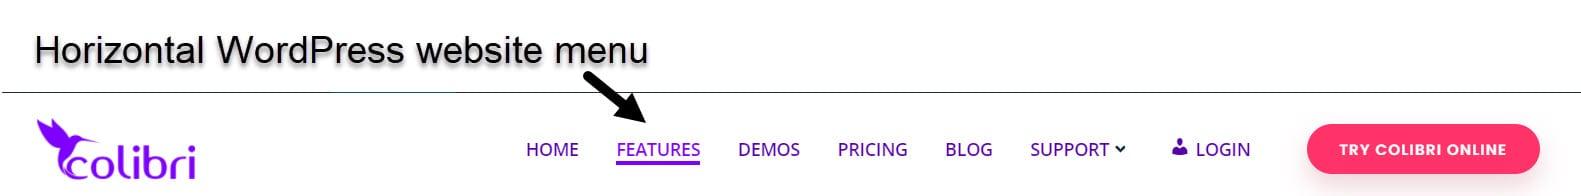 horizontal WordPress menu example